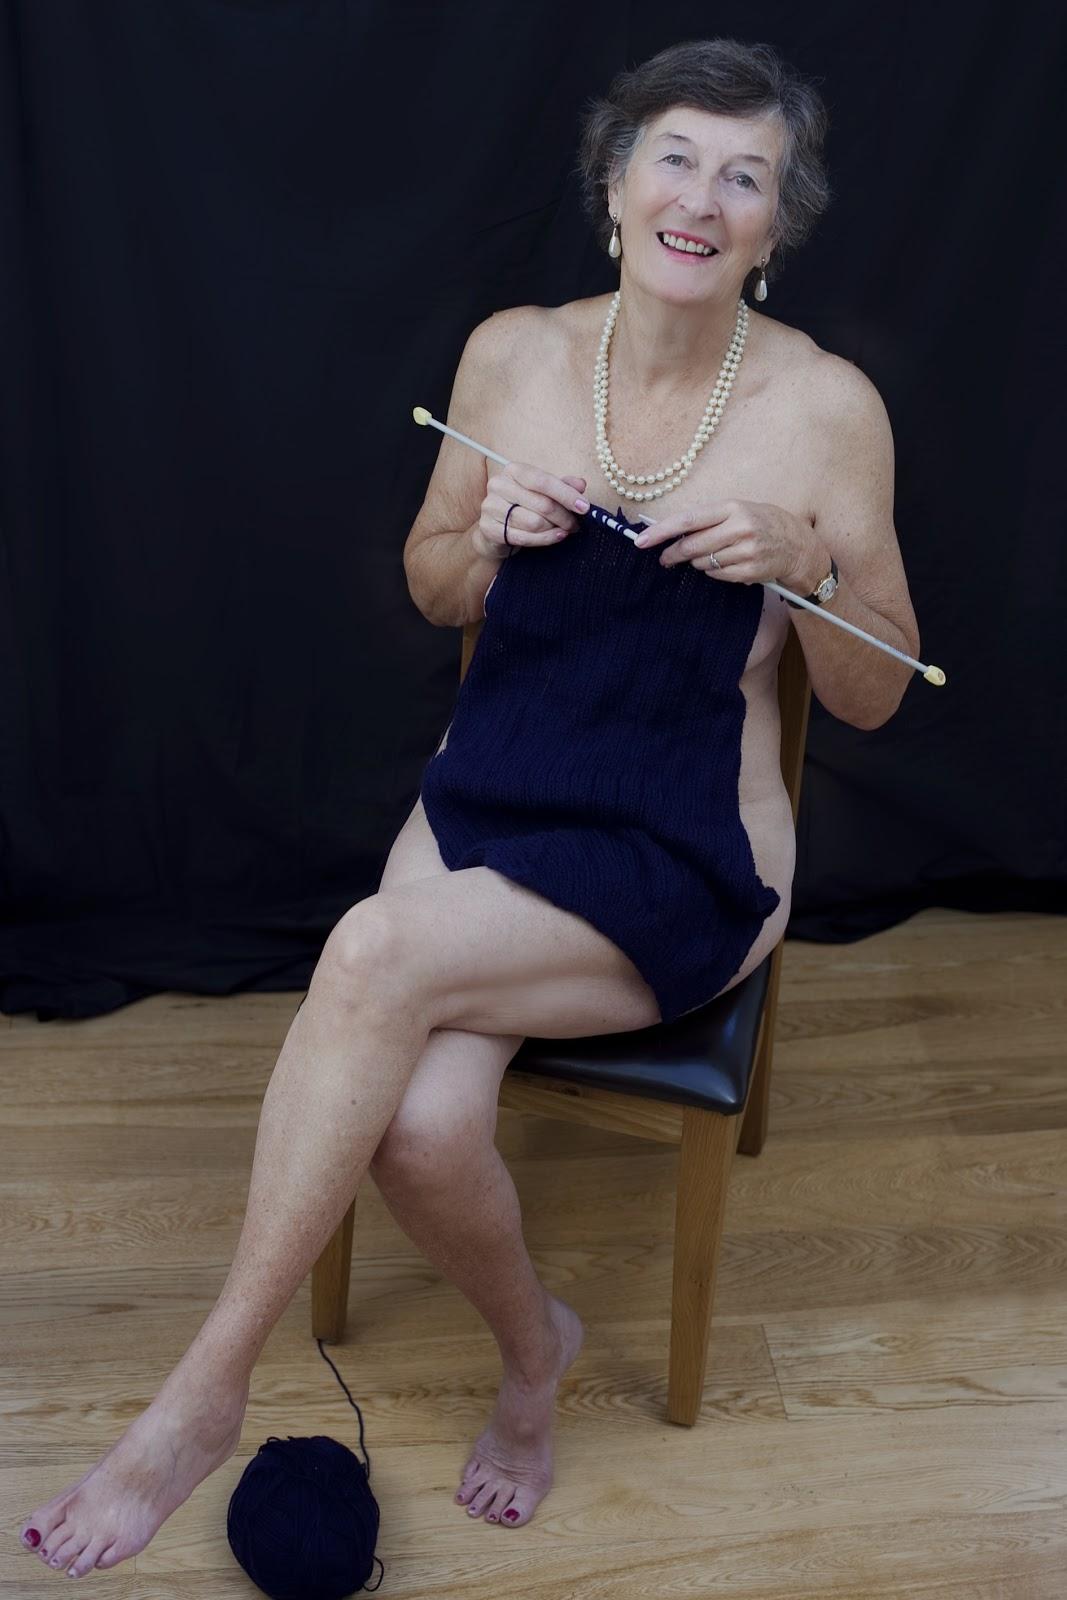 Attractive Older Women Simple Nude Pics